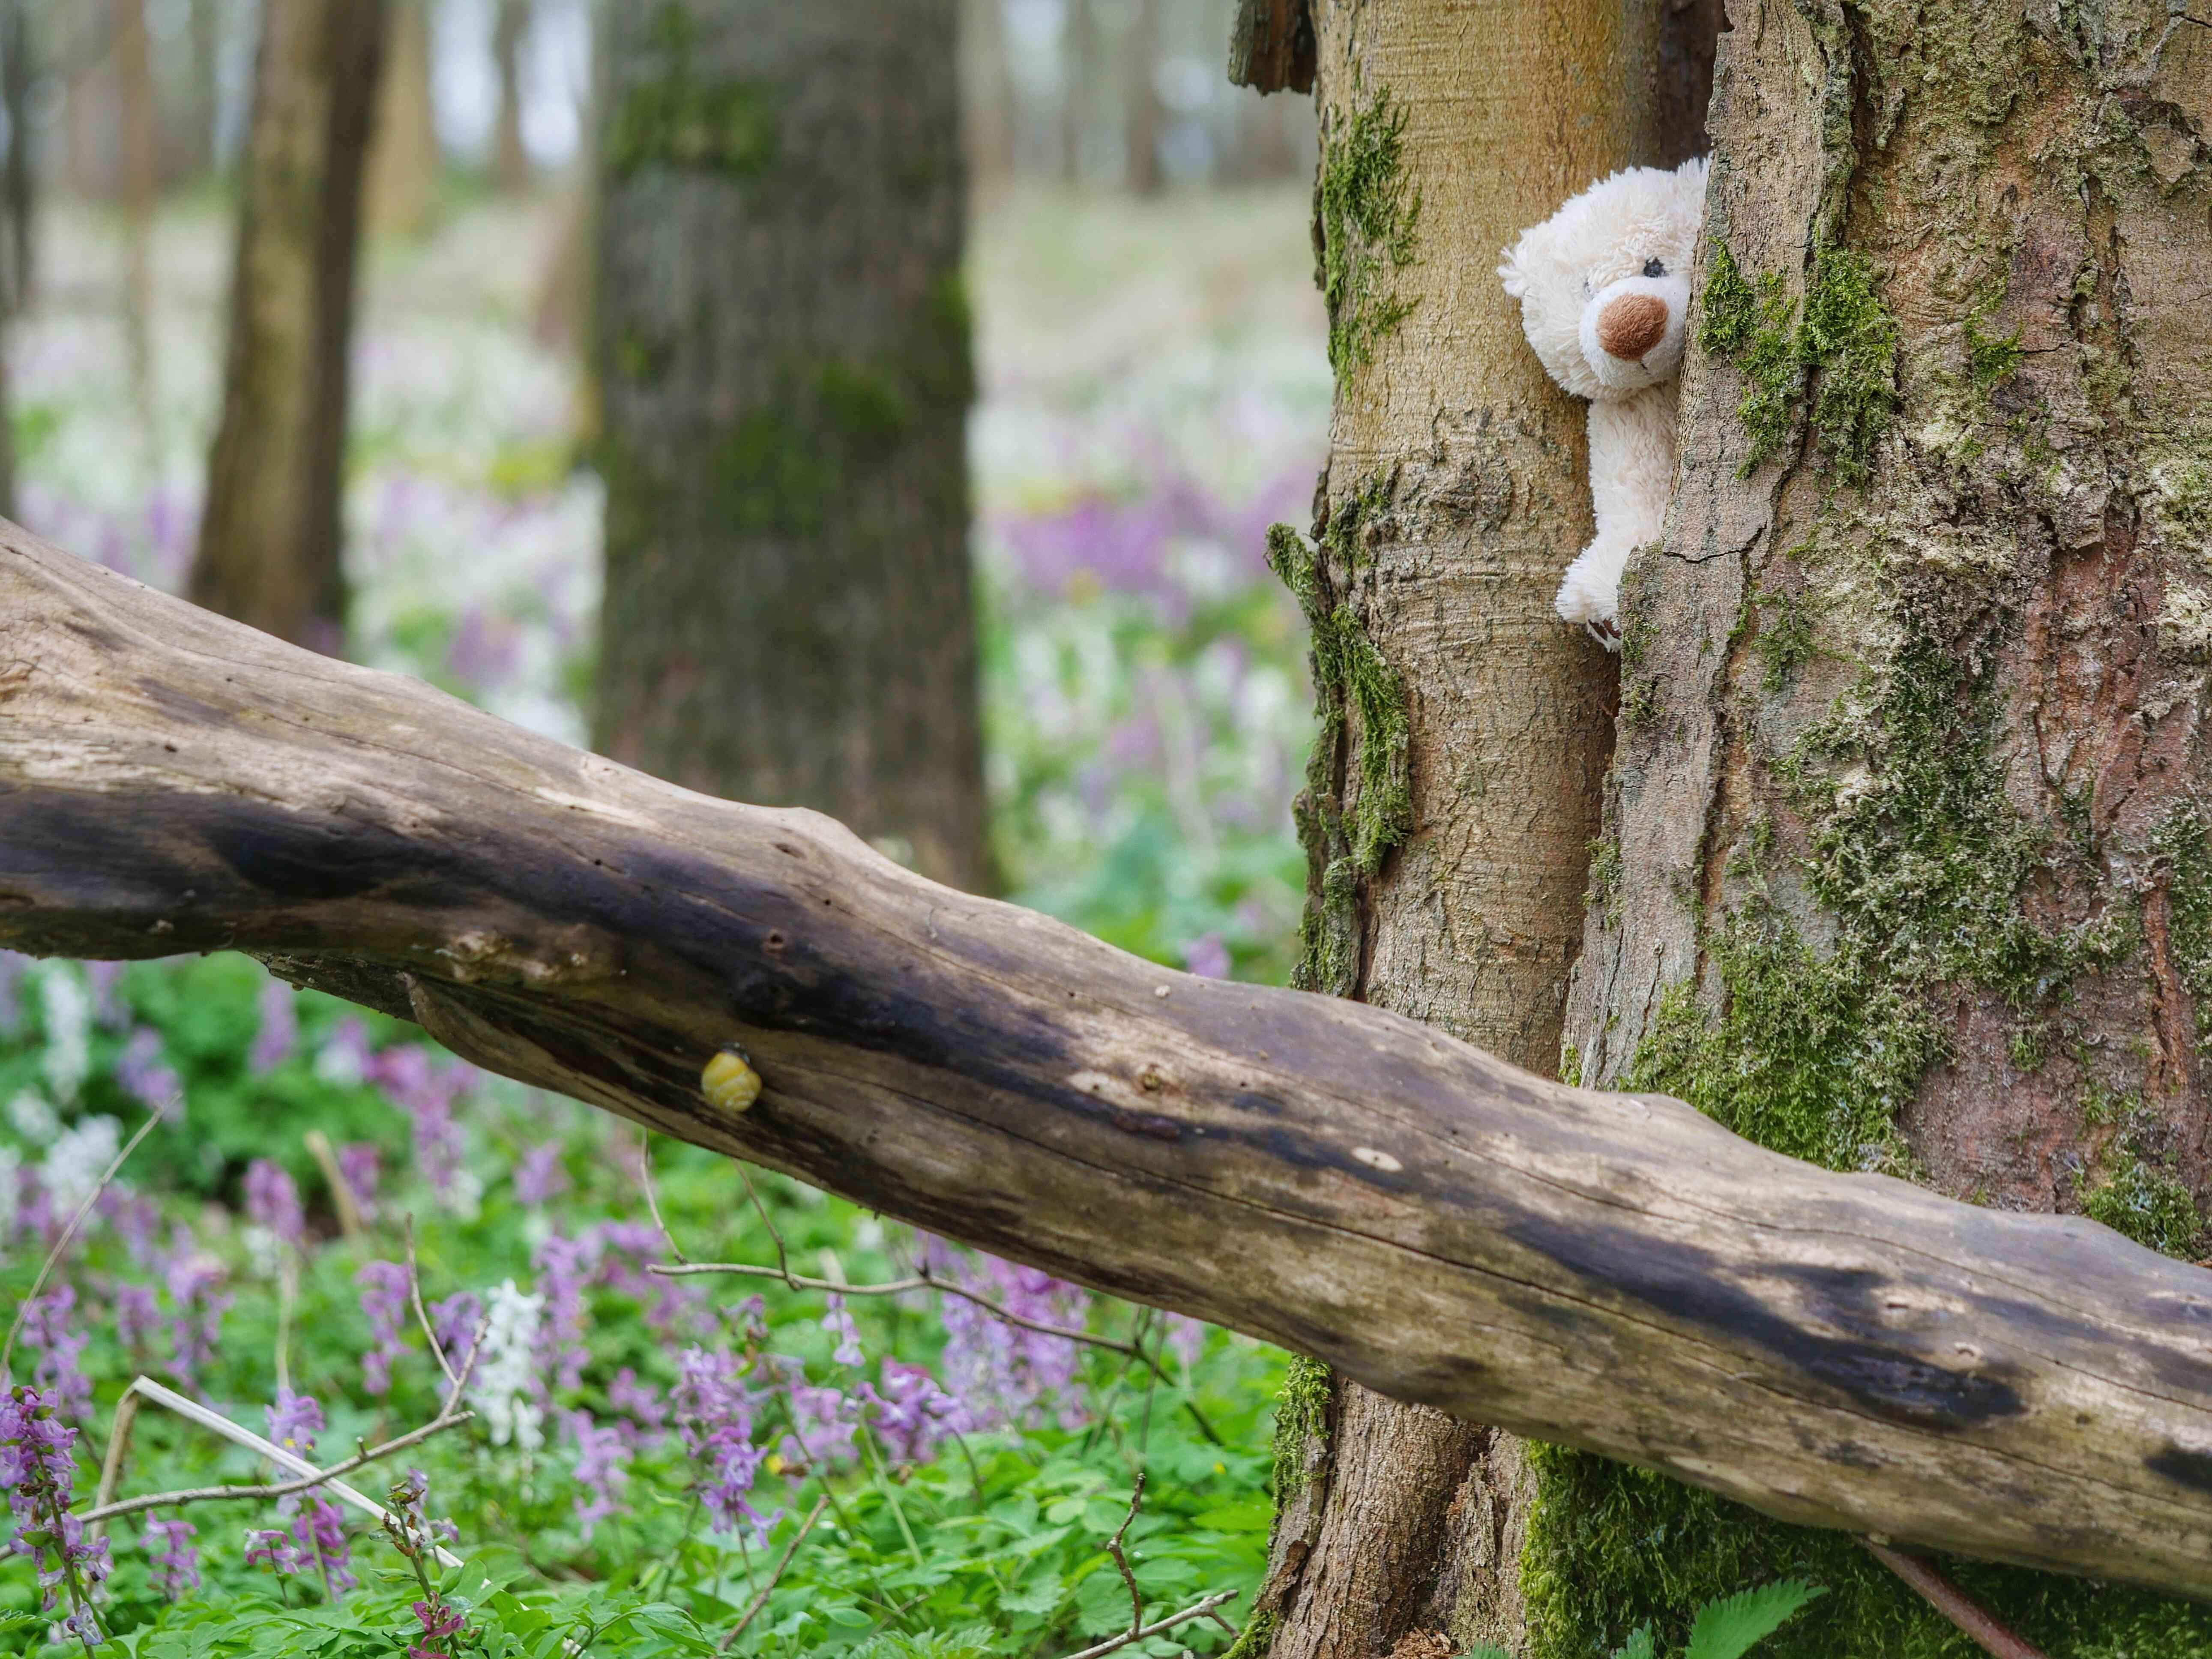 Teddy Bear Stuck Amidst Tree Trunk